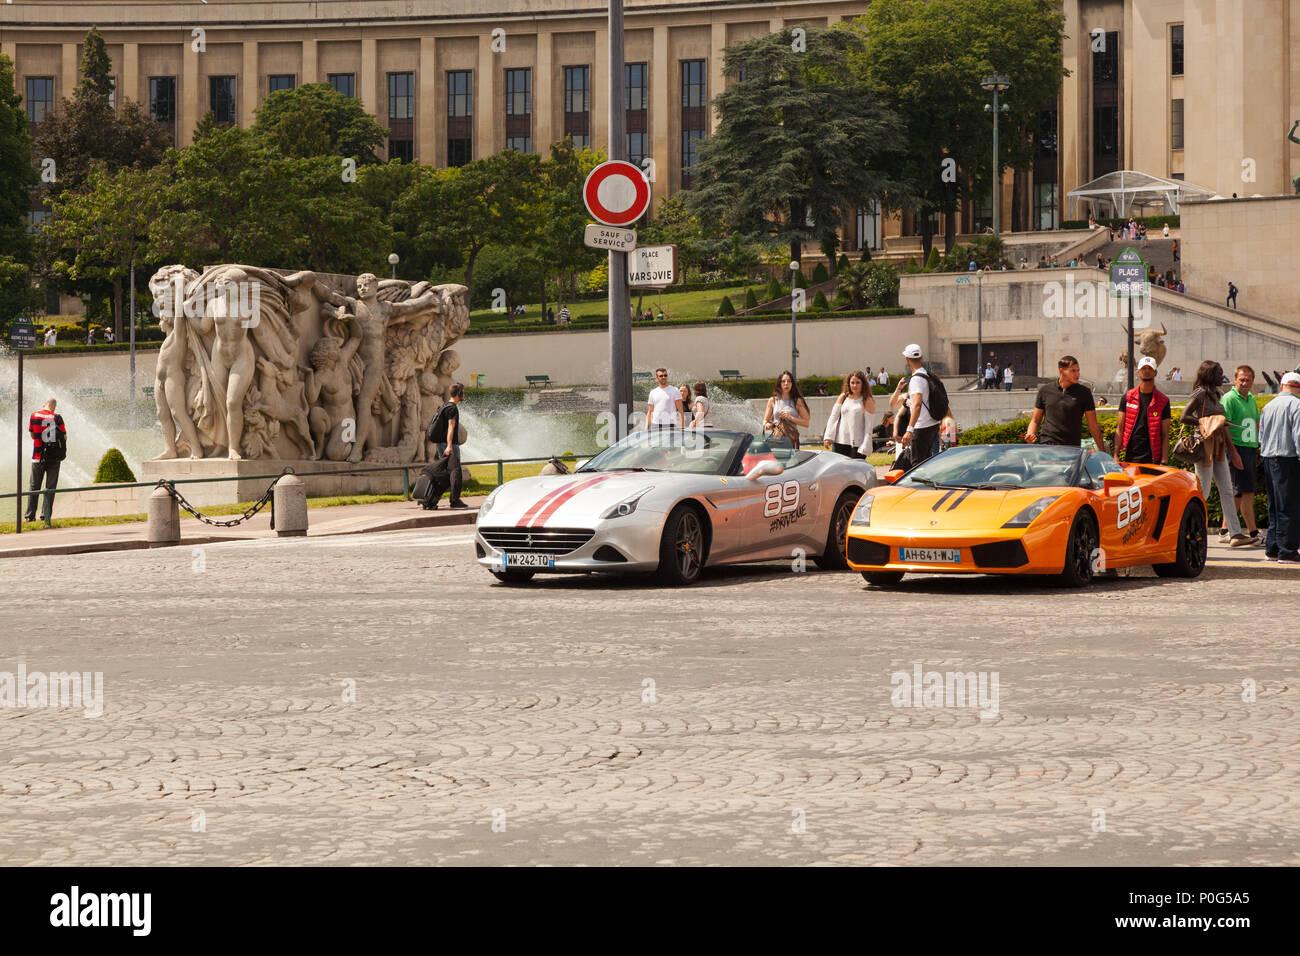 Spots cars parked near the Trocadéro, Paris, France. - Stock Image